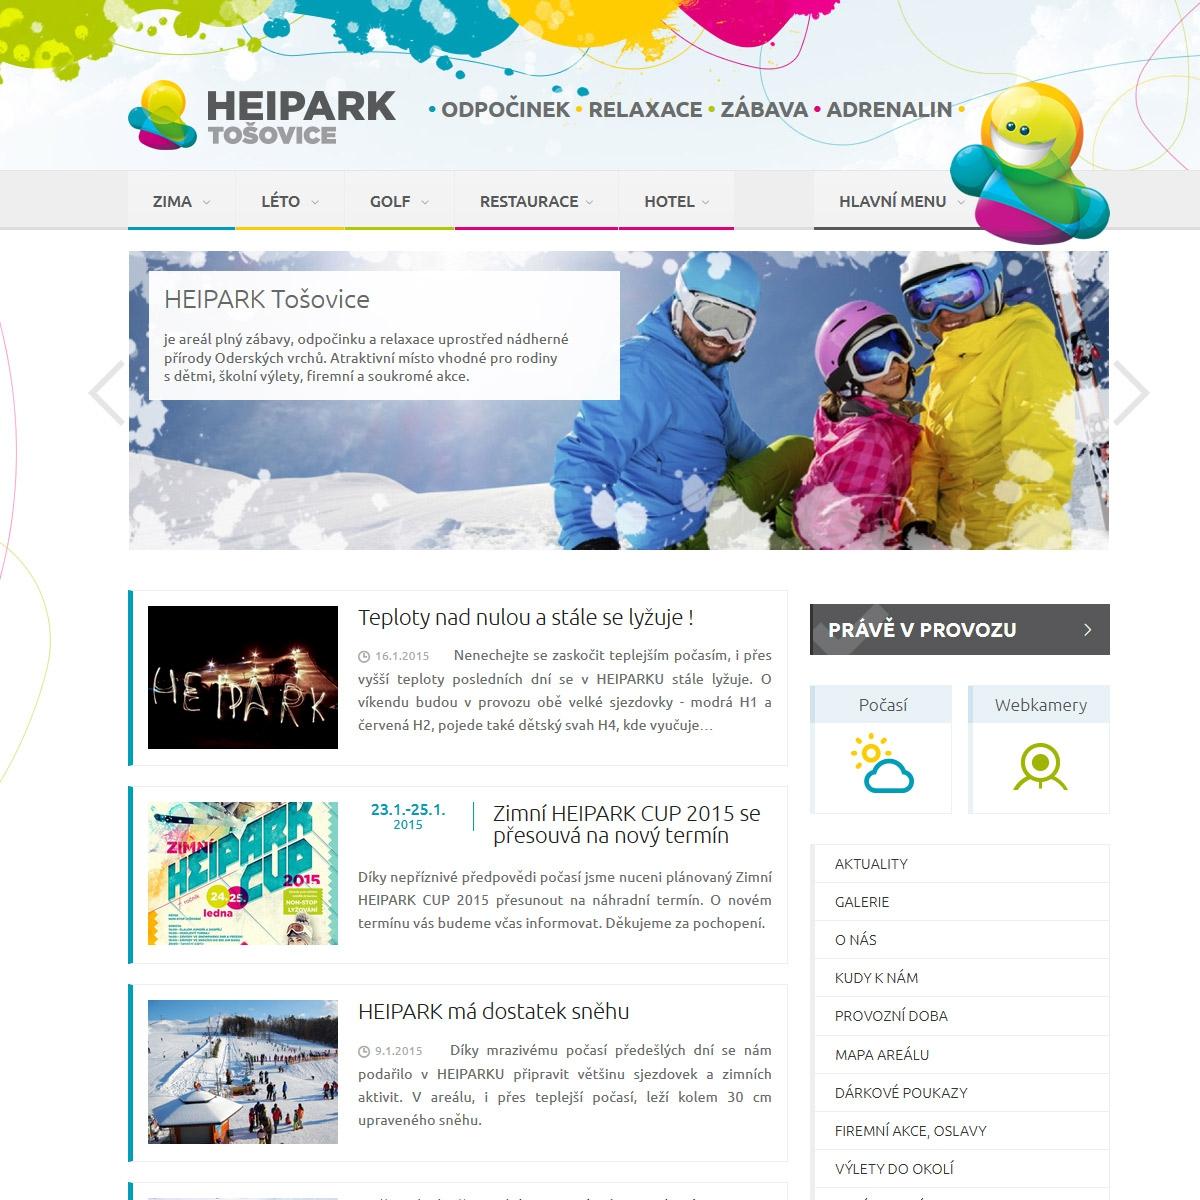 Fotografie heipark2014-2_big.jpg